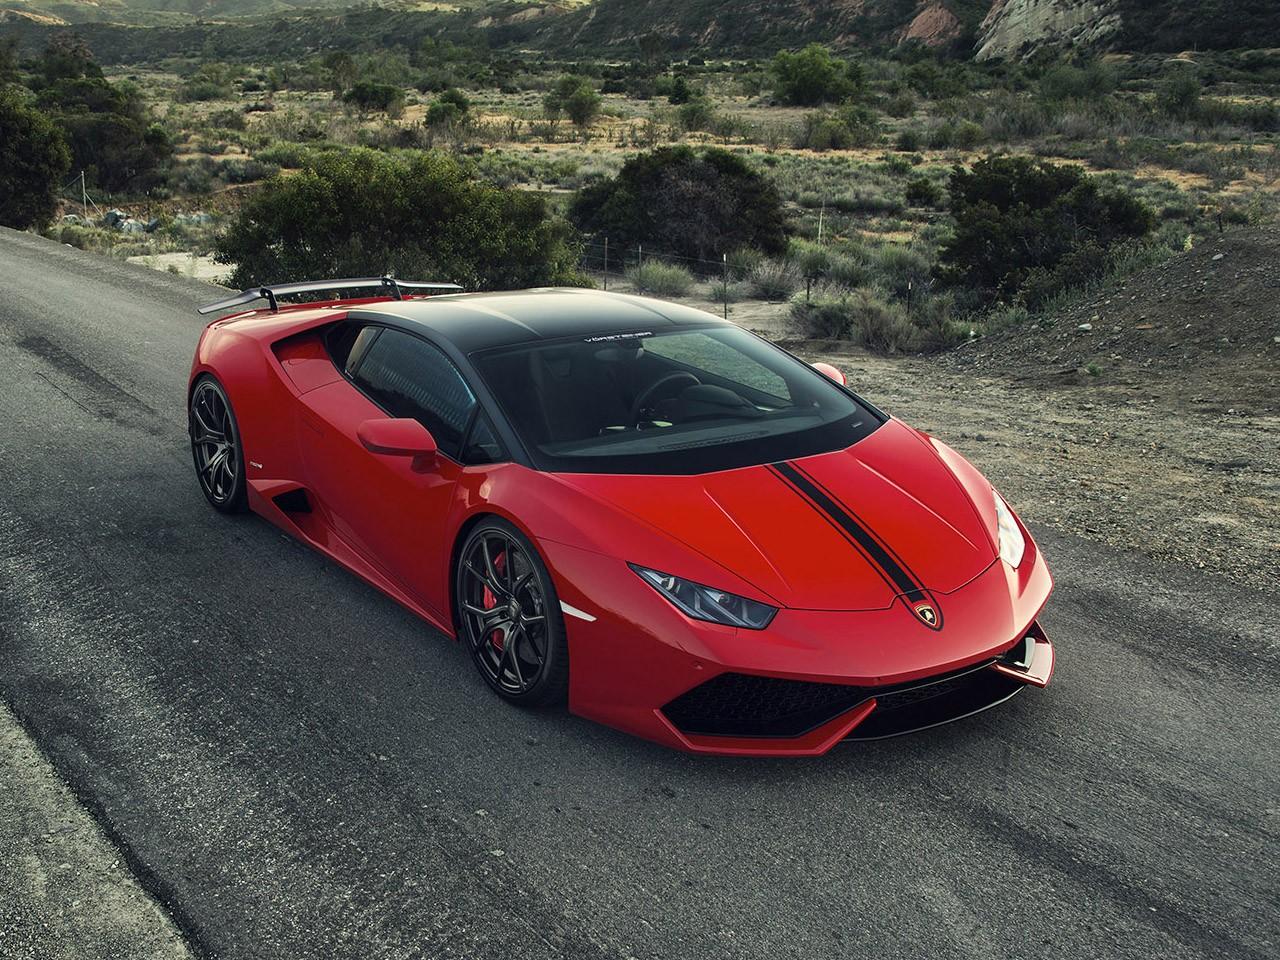 Lamborghini Huracan Verona Edizione 2015 - Vorsteiner